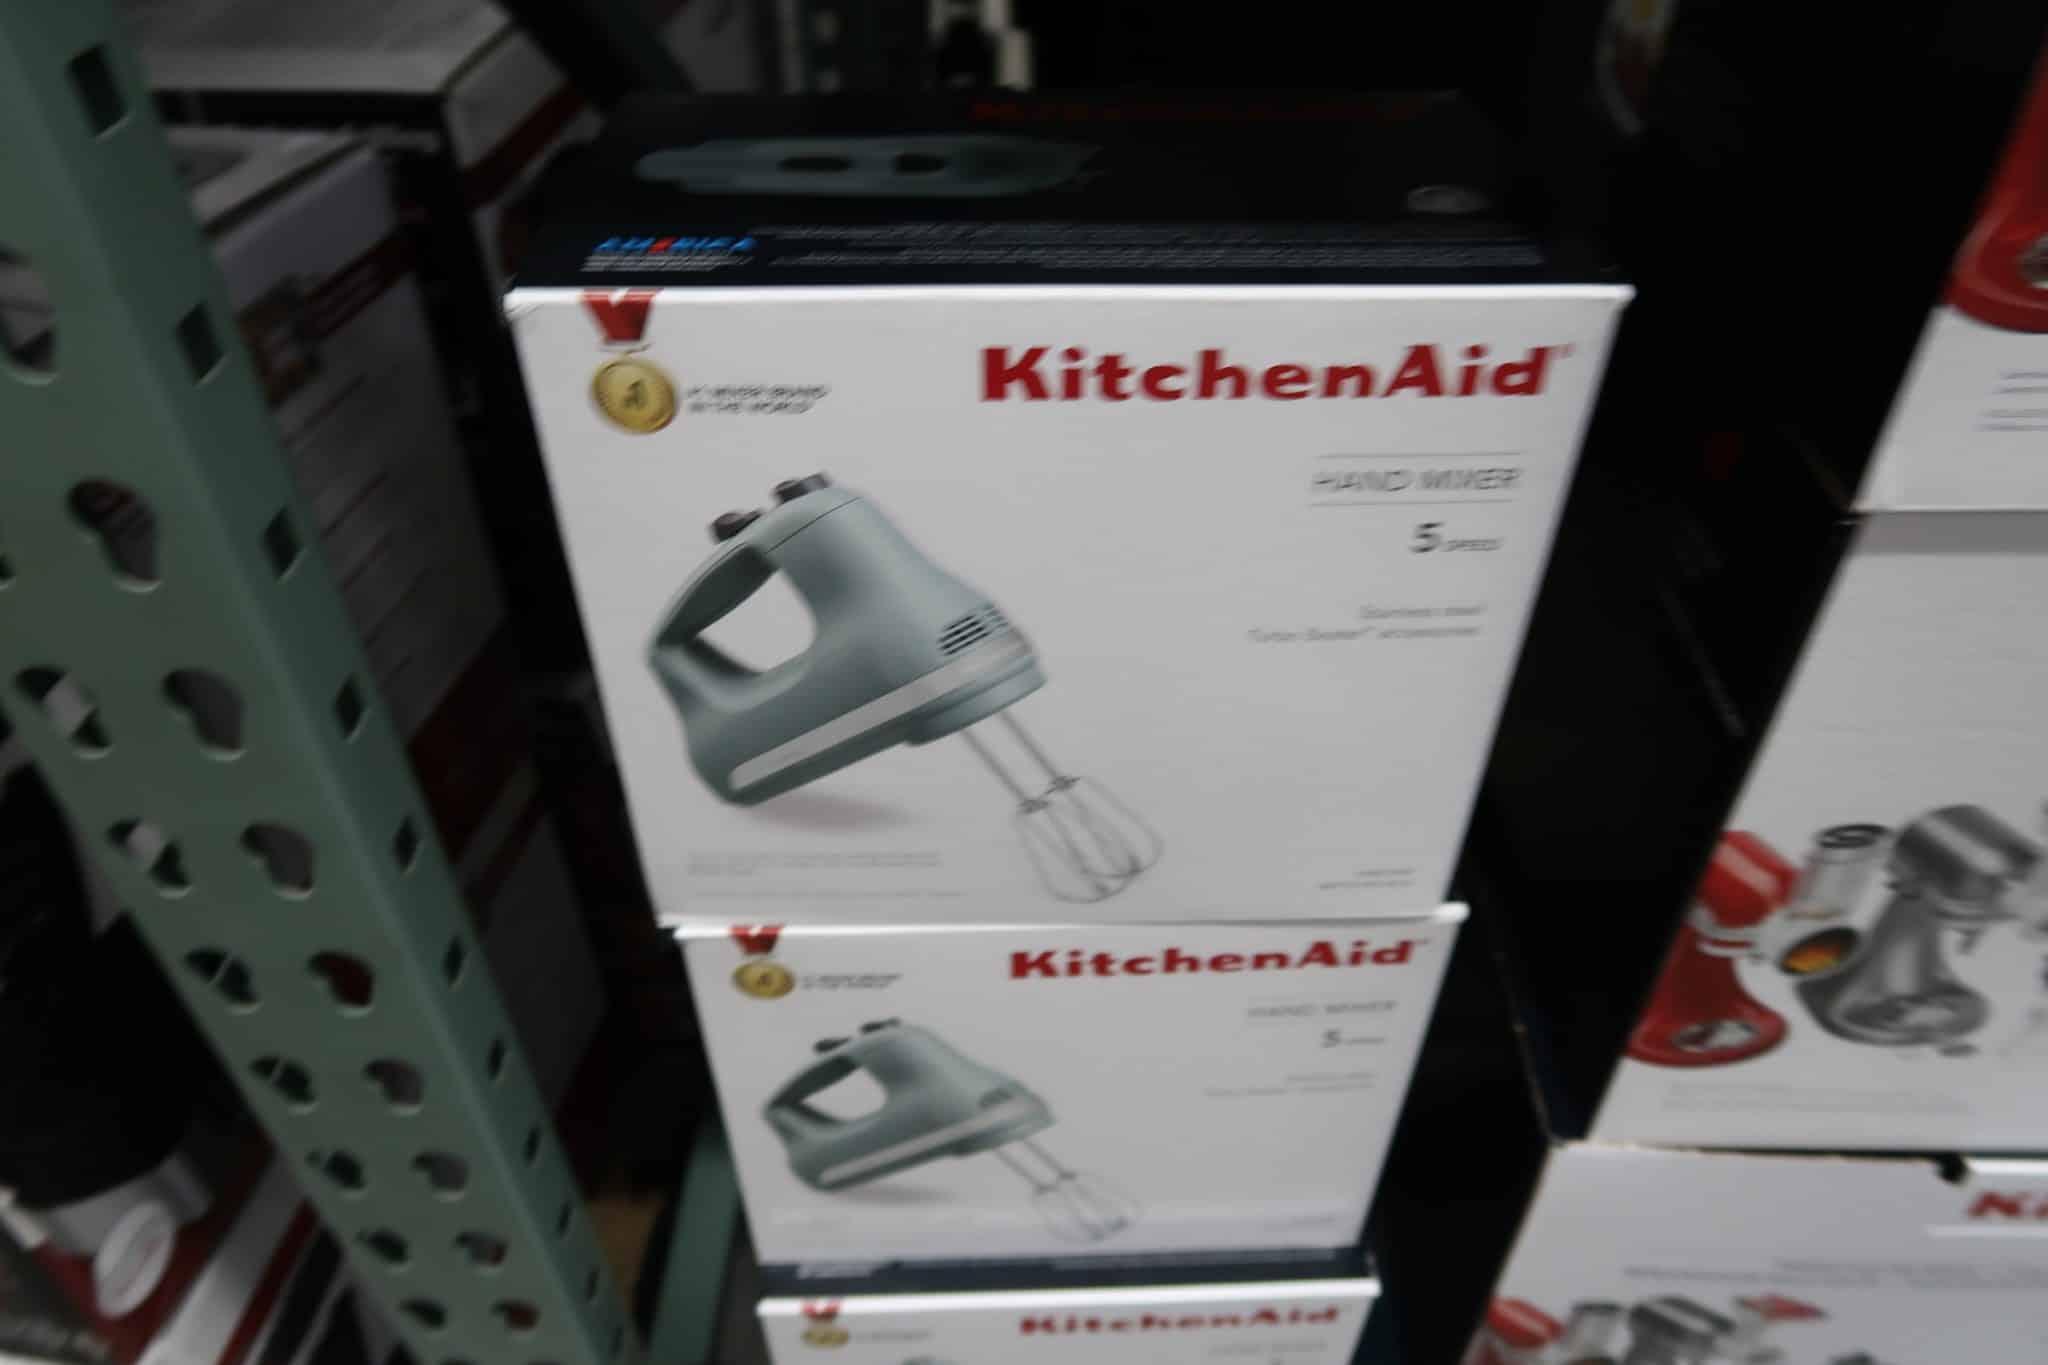 Kitchenaid Hand Mixer $39.99